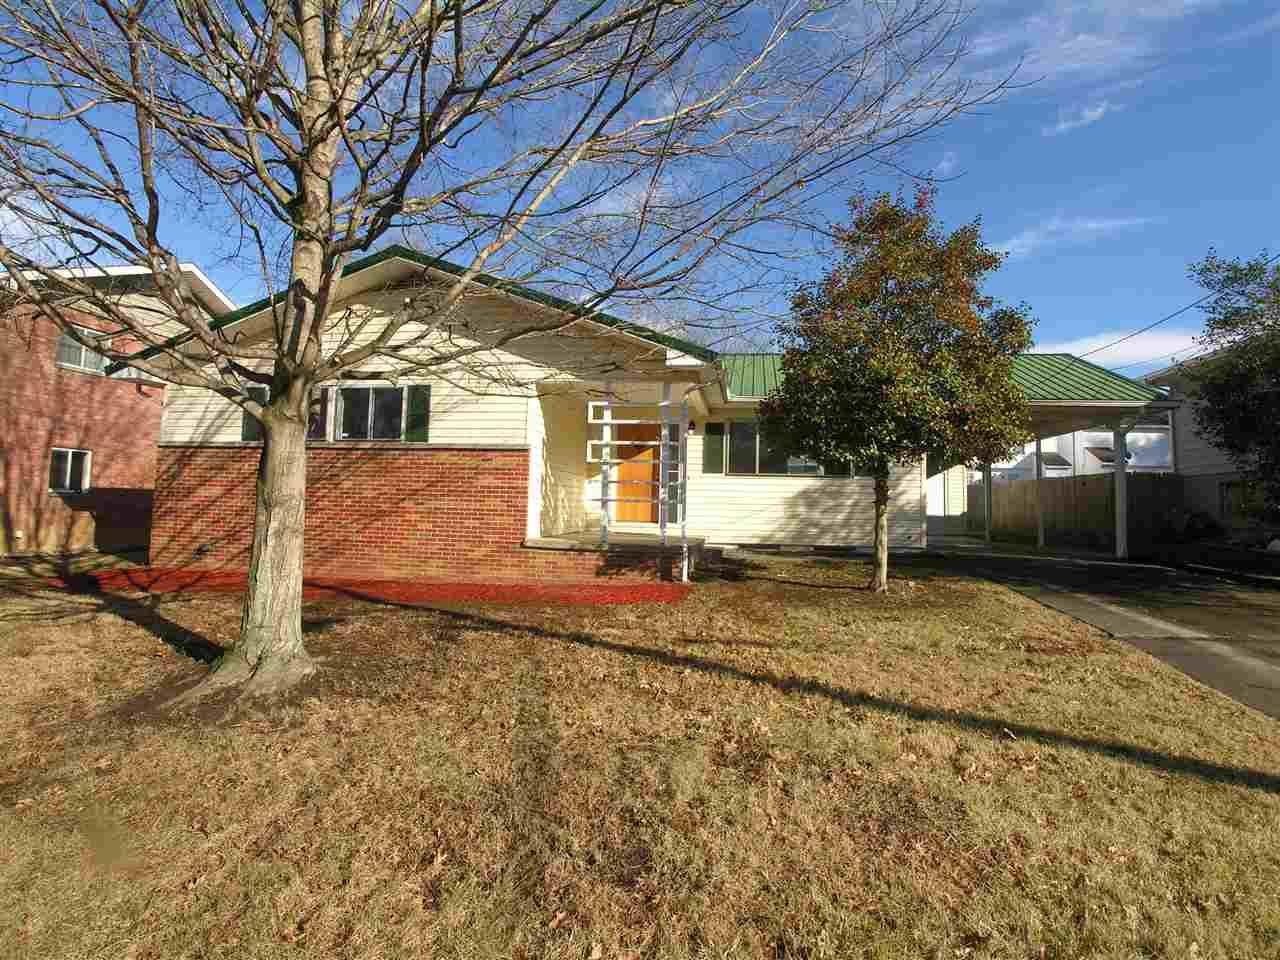 6183 Birkewood Rd, Huntington, WV 25705 | RealEstate.com